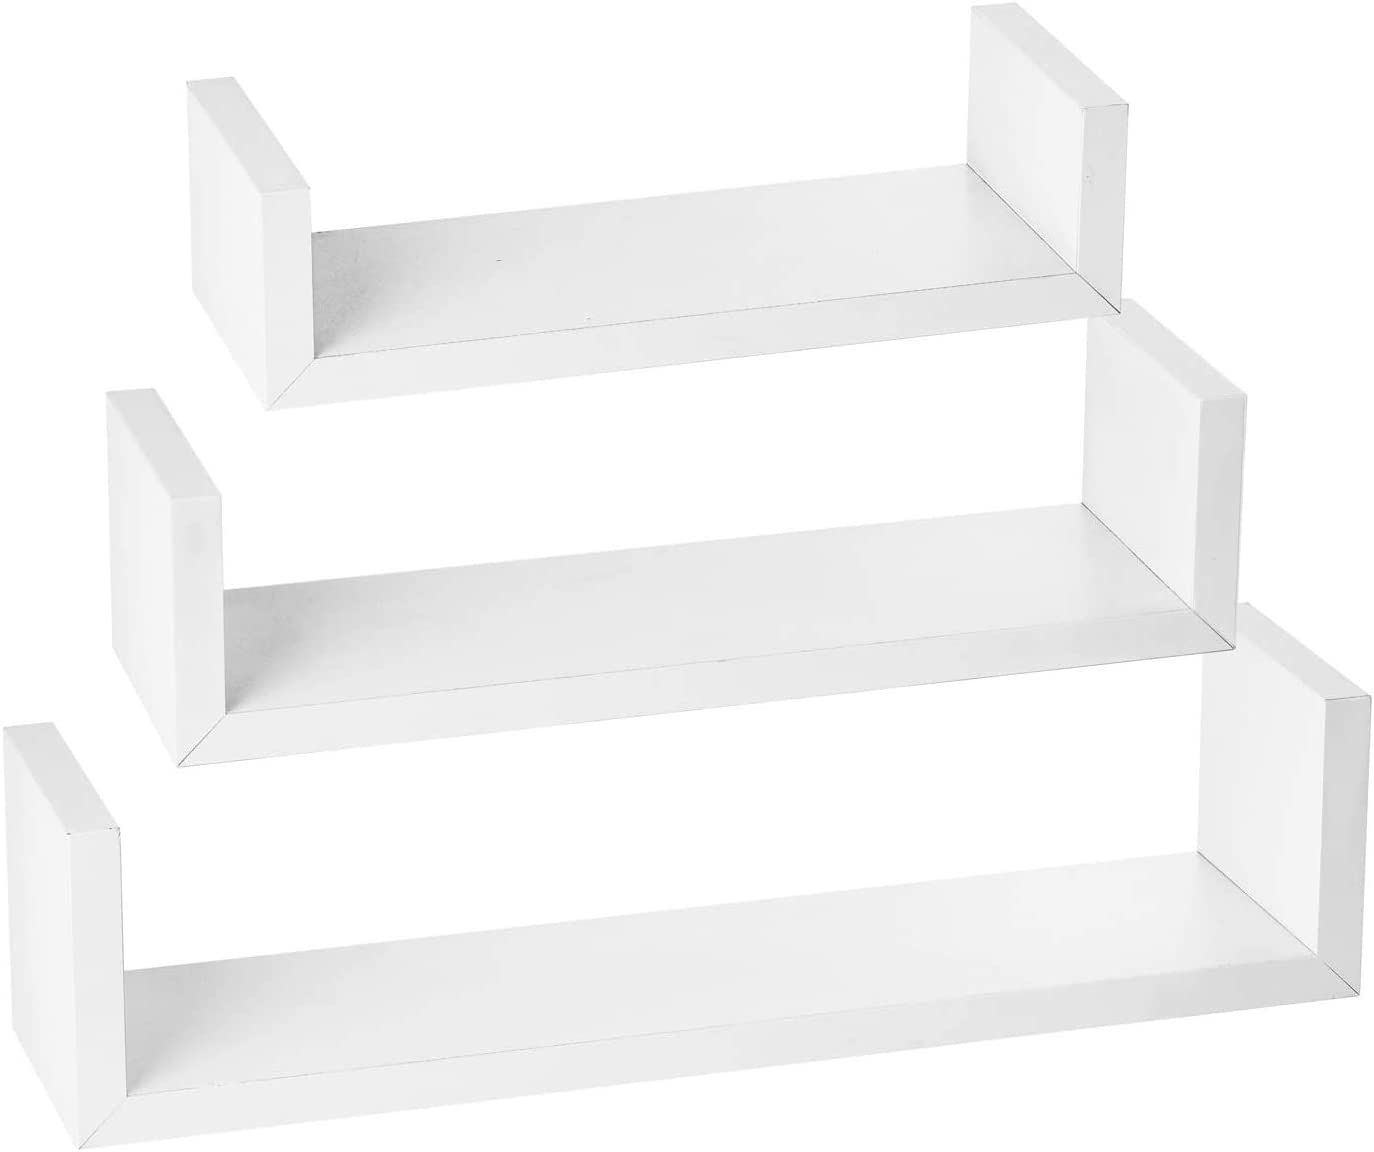 Halter Wall Mount Decorative Floating Shelf, Multipurpose Hanging Storage, Set of 3, Small to Large, White